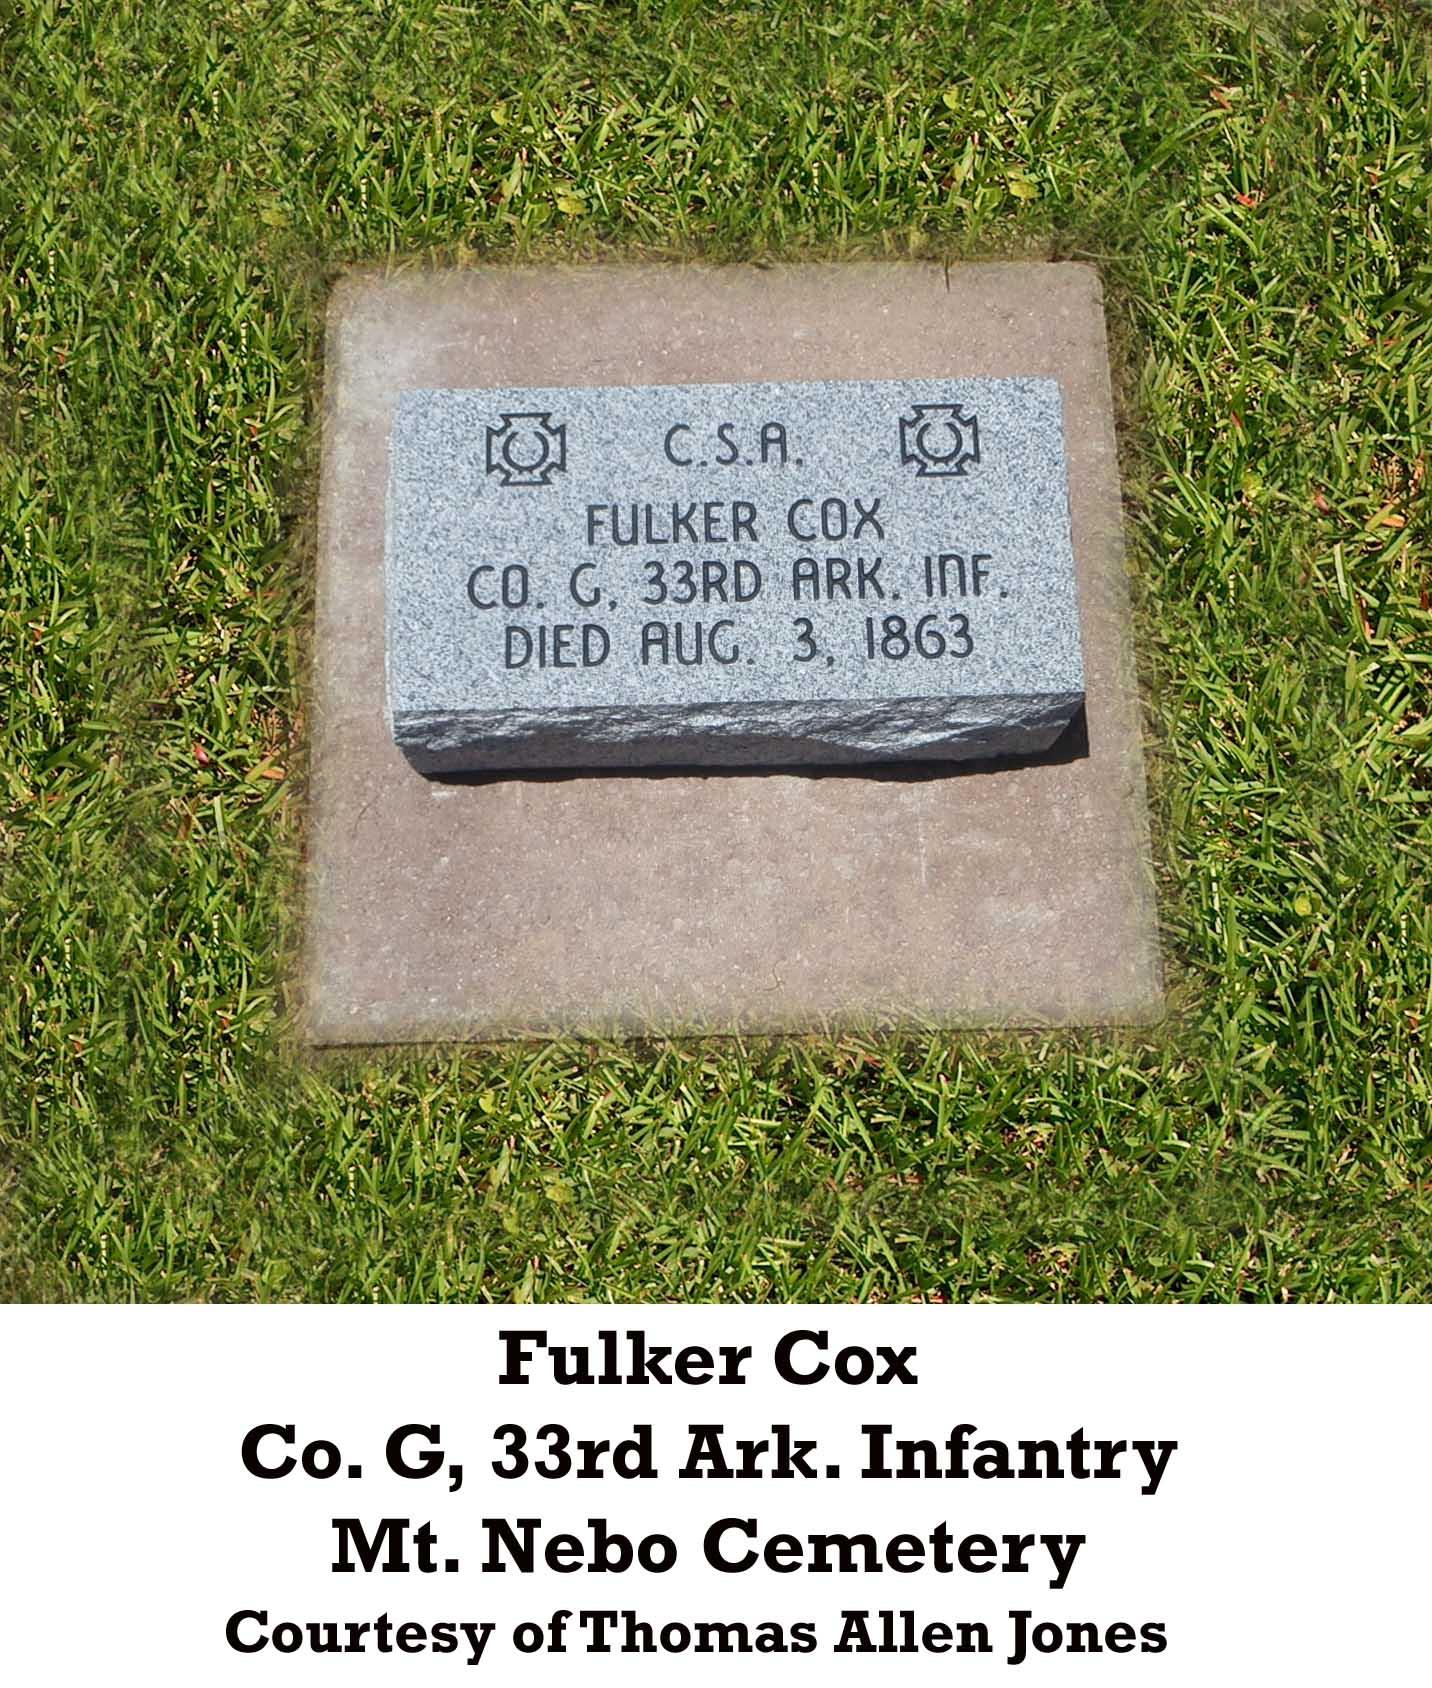 Fulker Cox